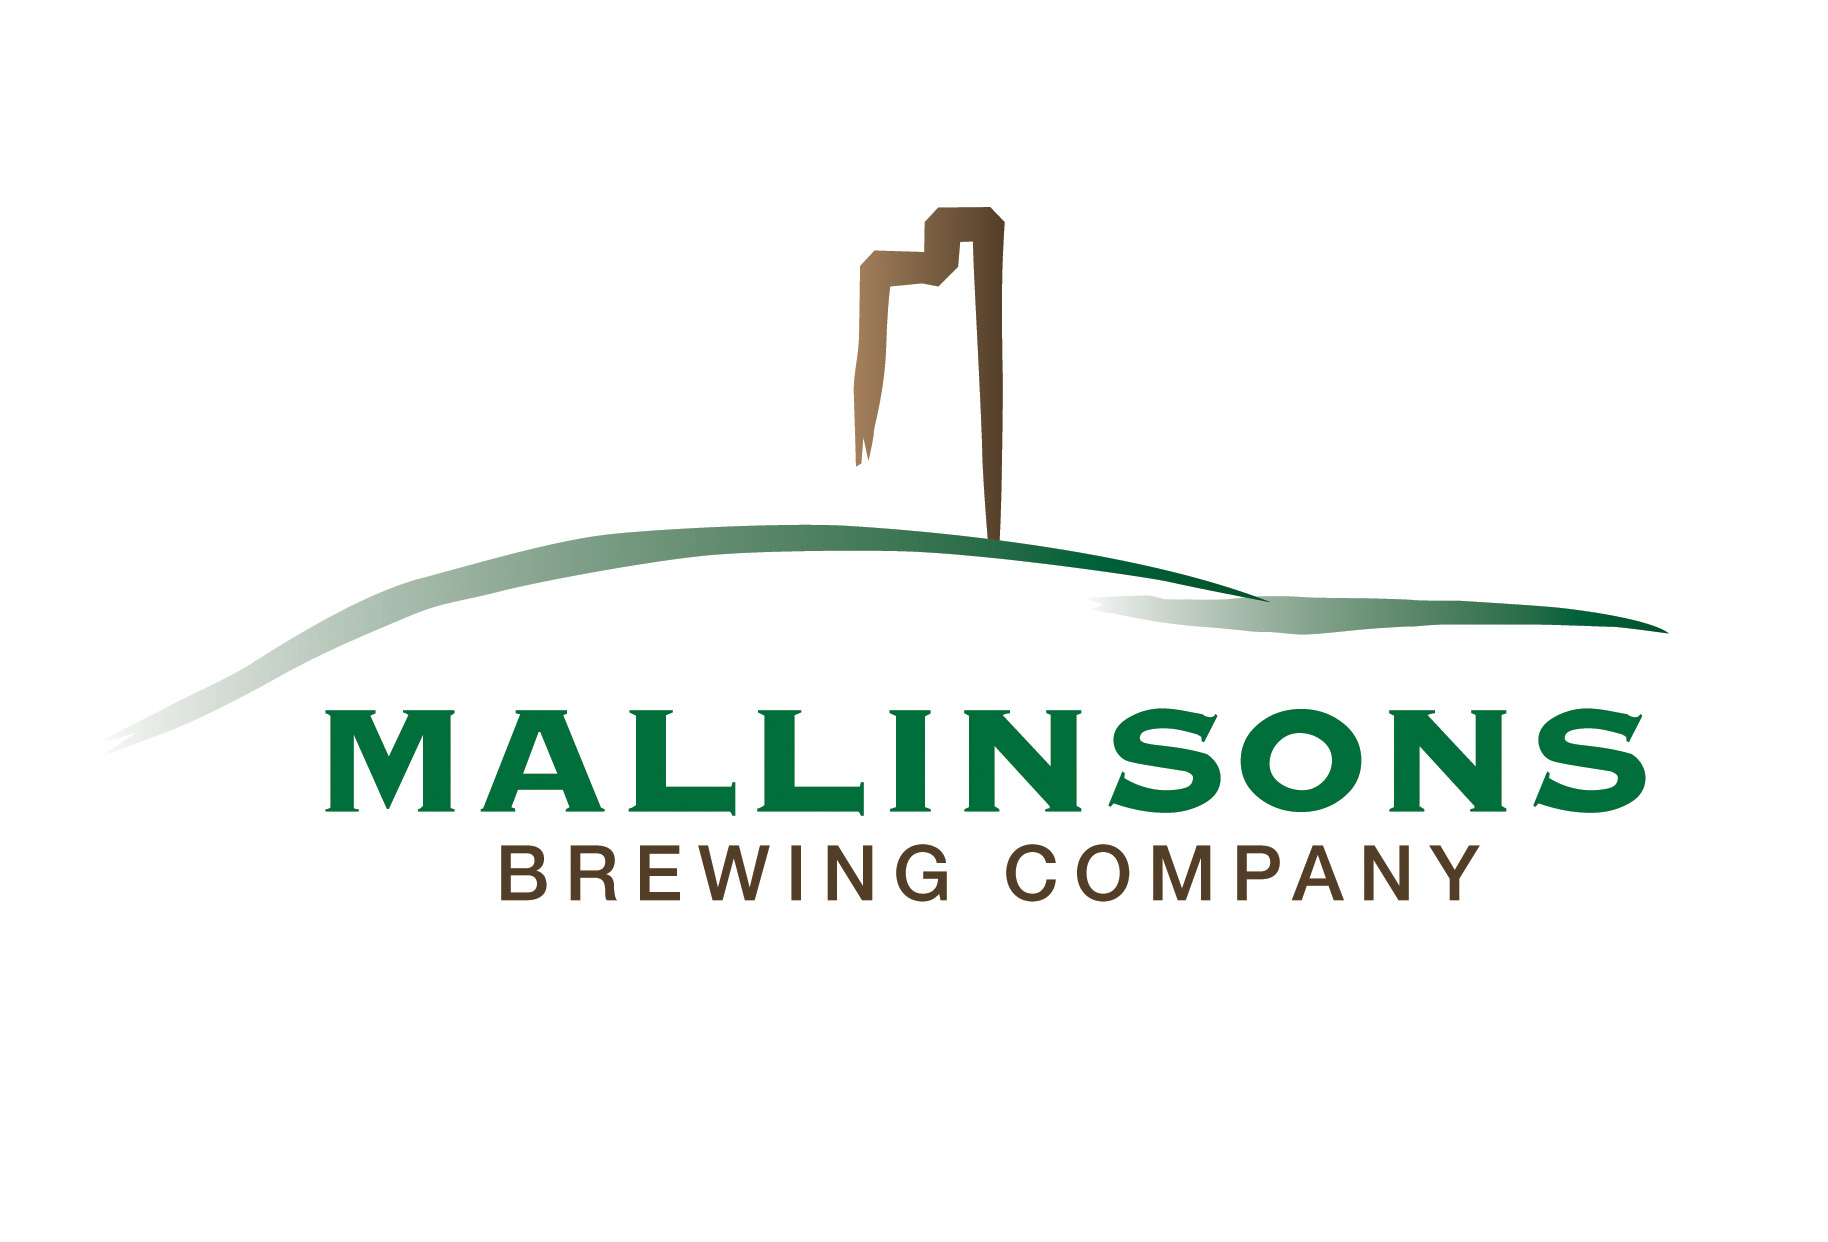 Mallinsons